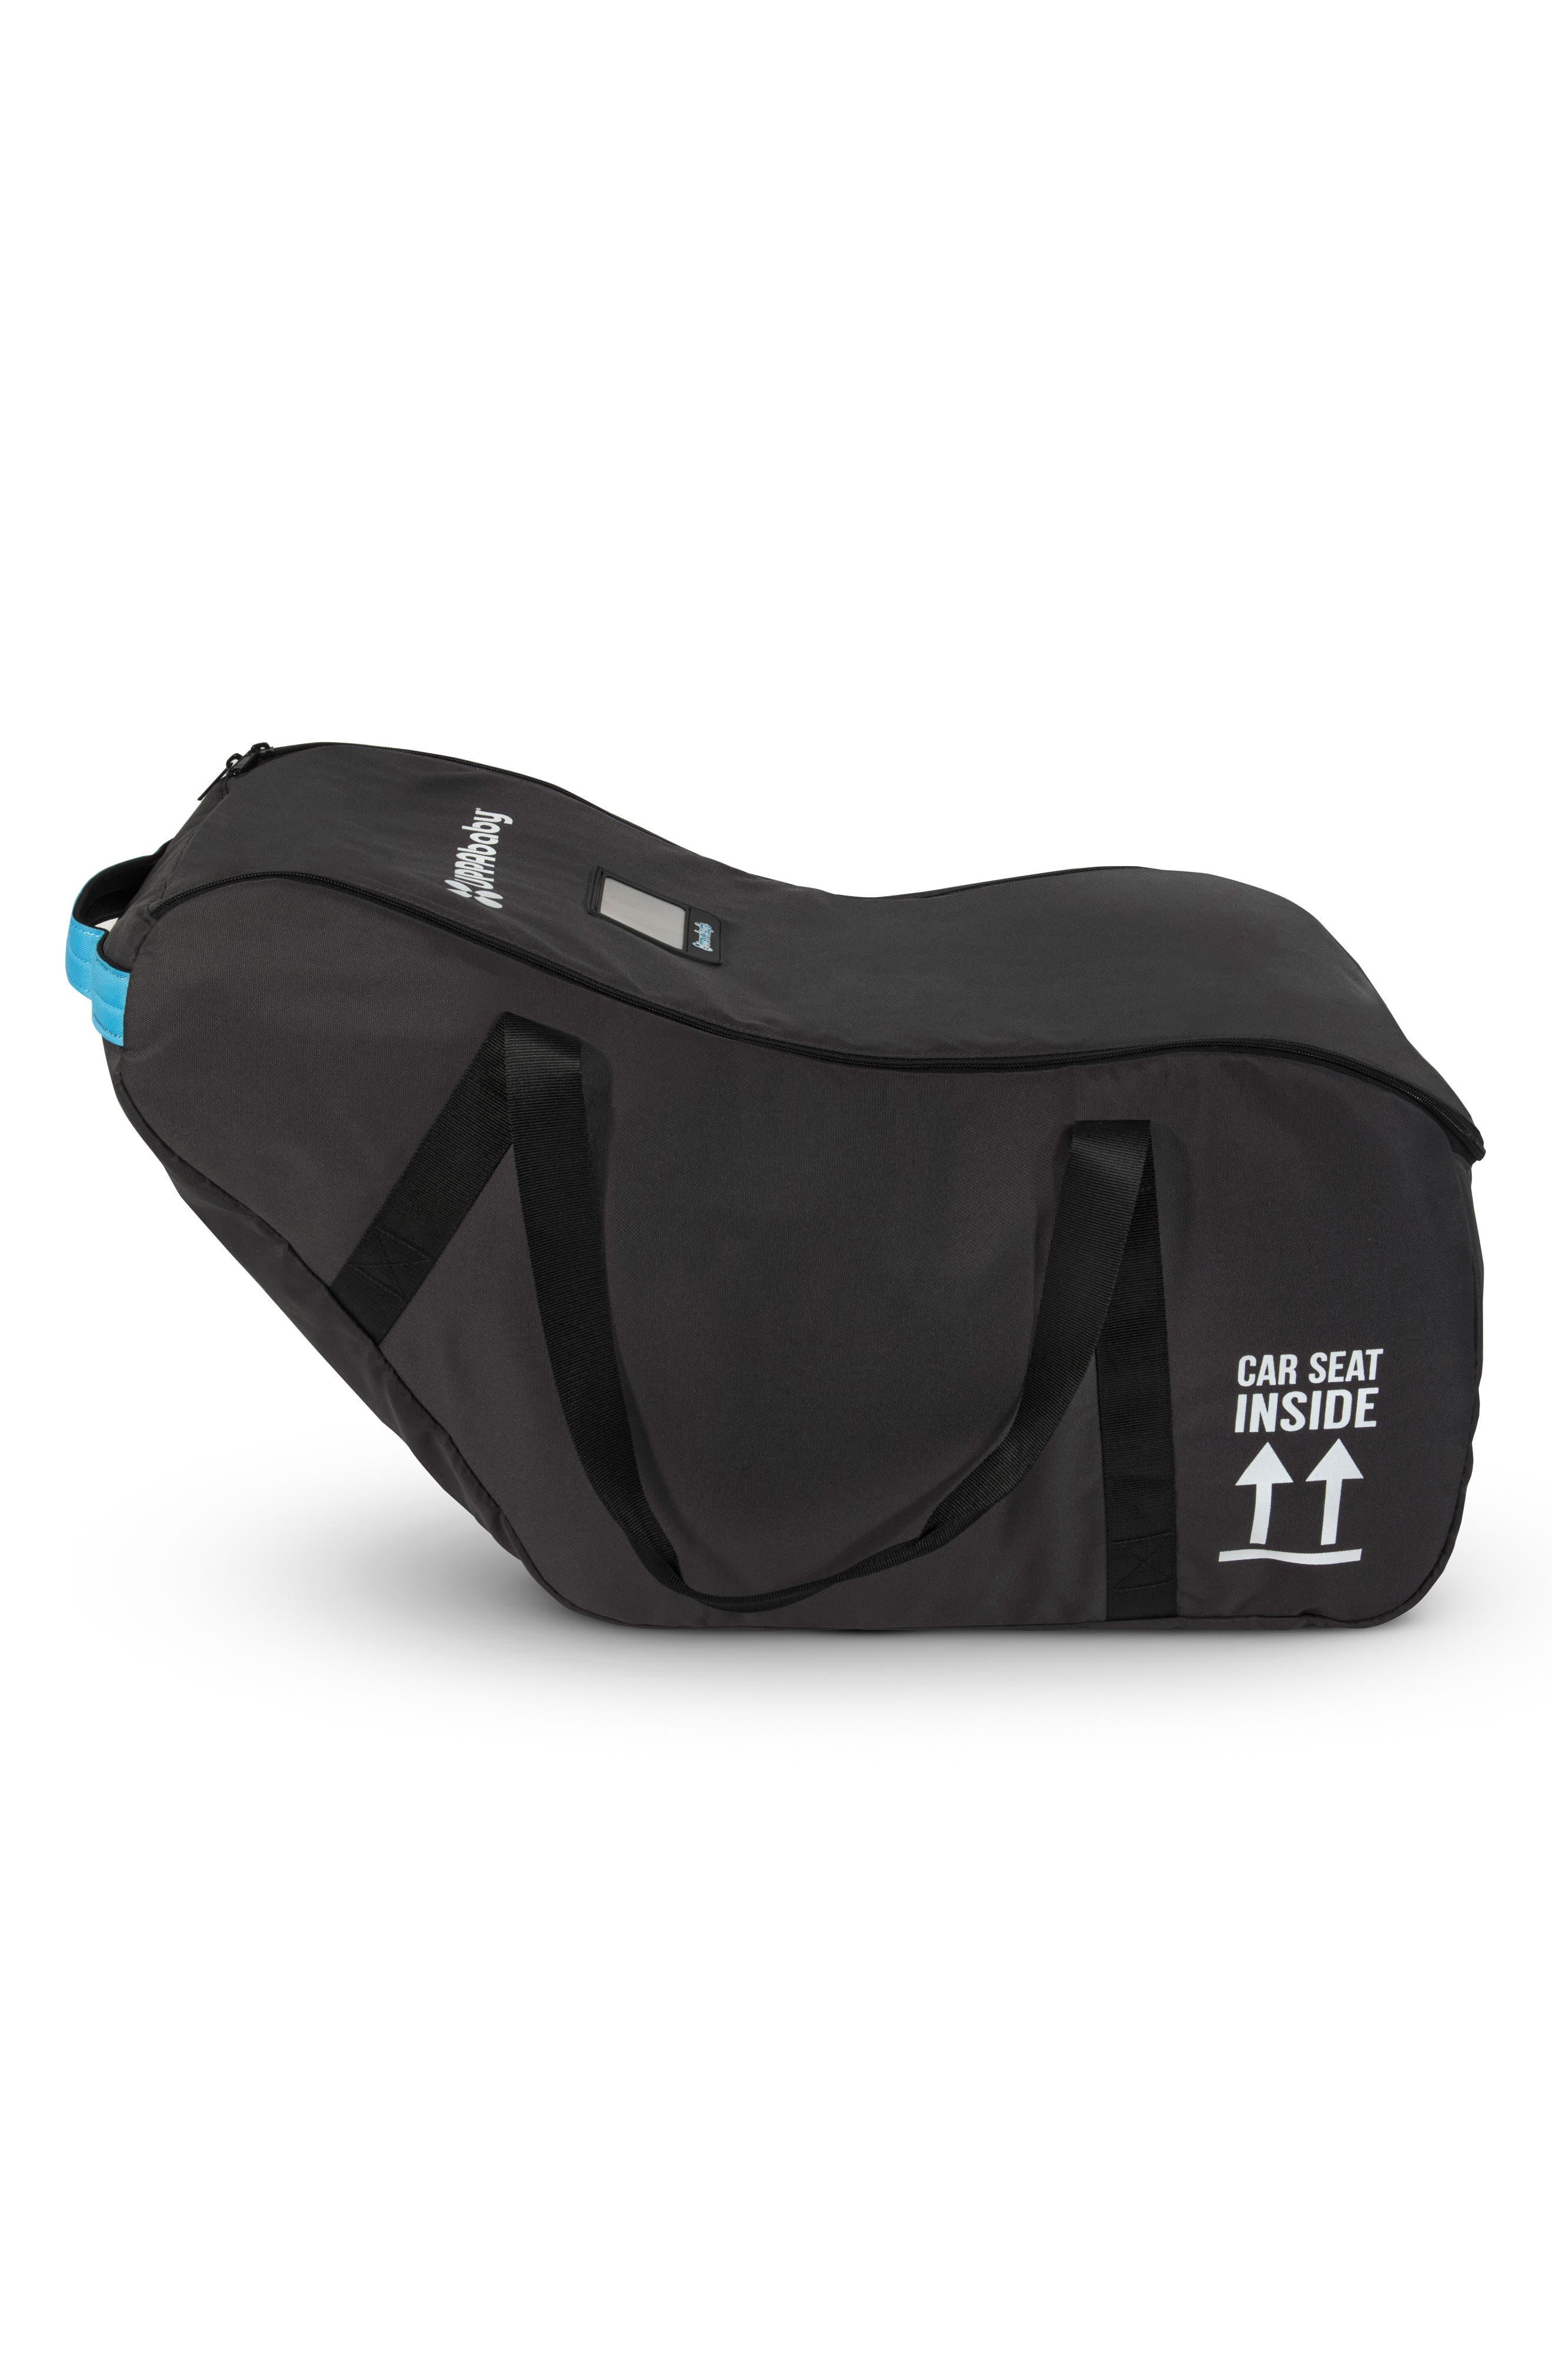 MESA<sup>®</sup> Travel Bag,                         Main,                         color, BLACK